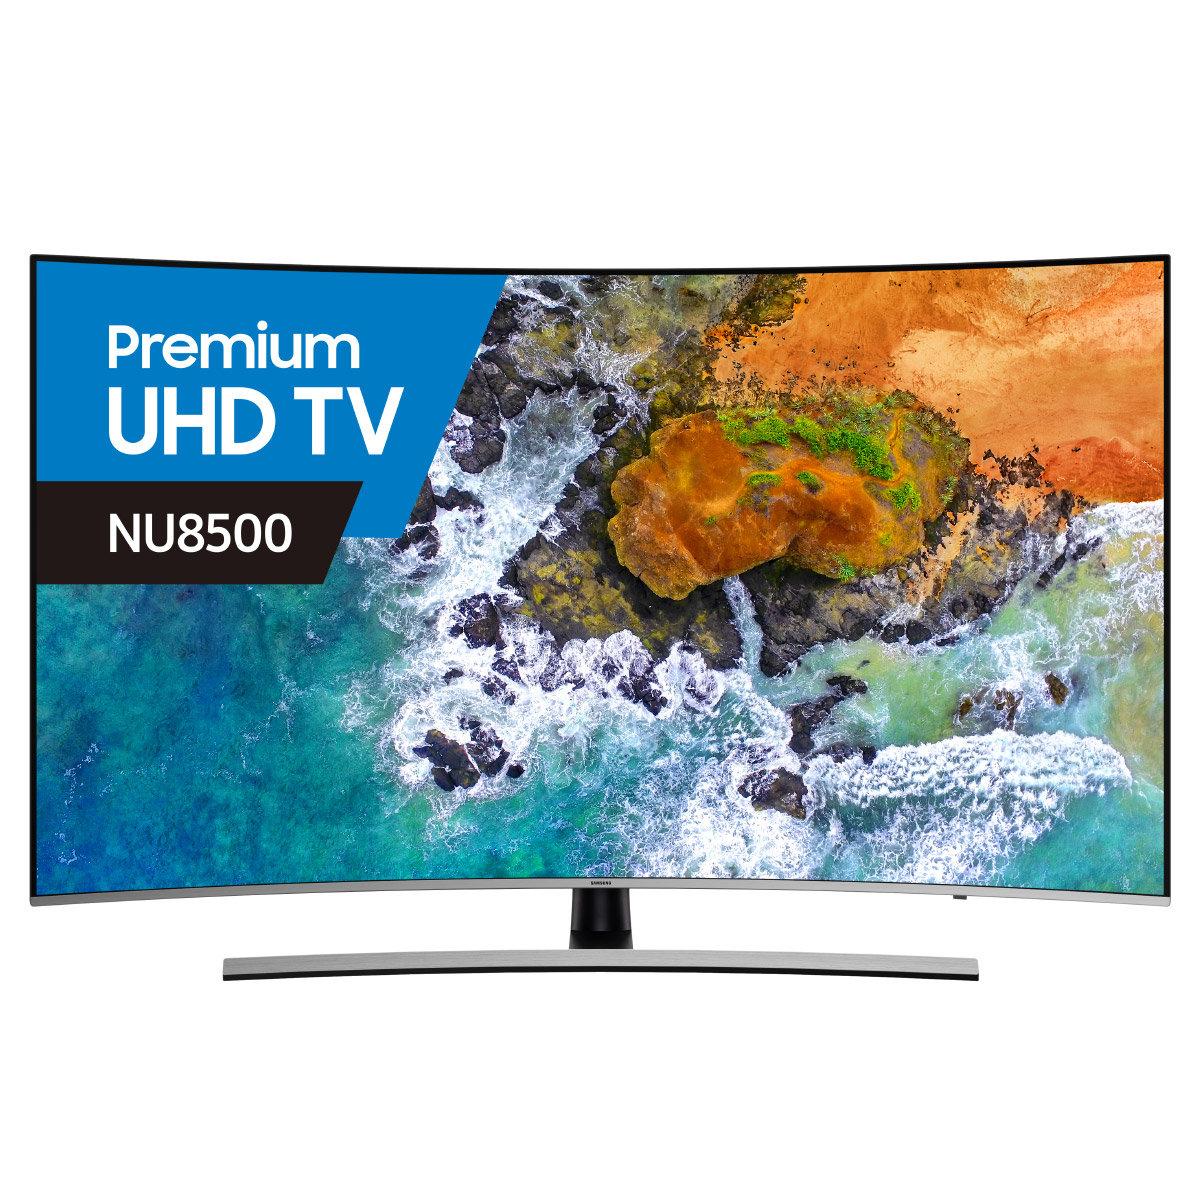 6545cf31c27 Samsung UA55NU8500 55 Inch 139cm Smart 4K Ultra HD Curved LED LCD TV ...